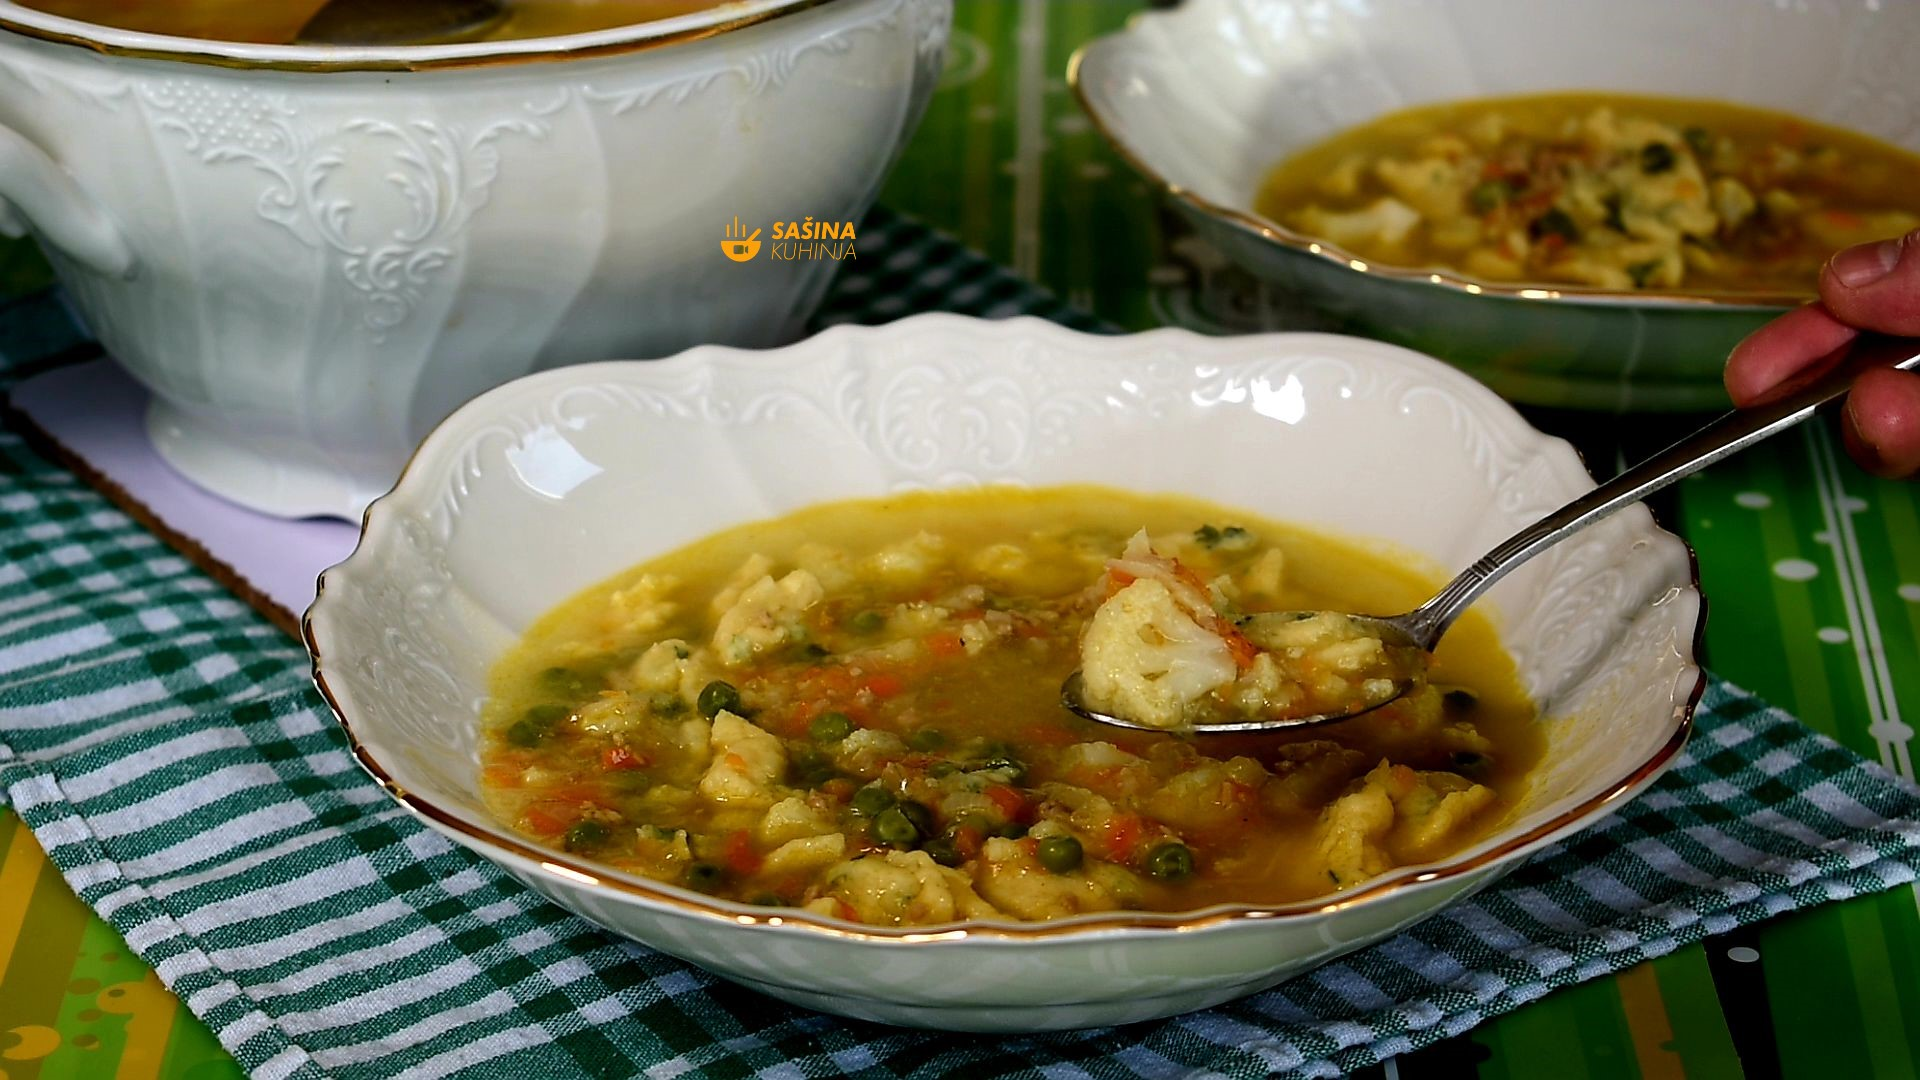 juha sa mljevenim mesom karfiolom noklicama graškom